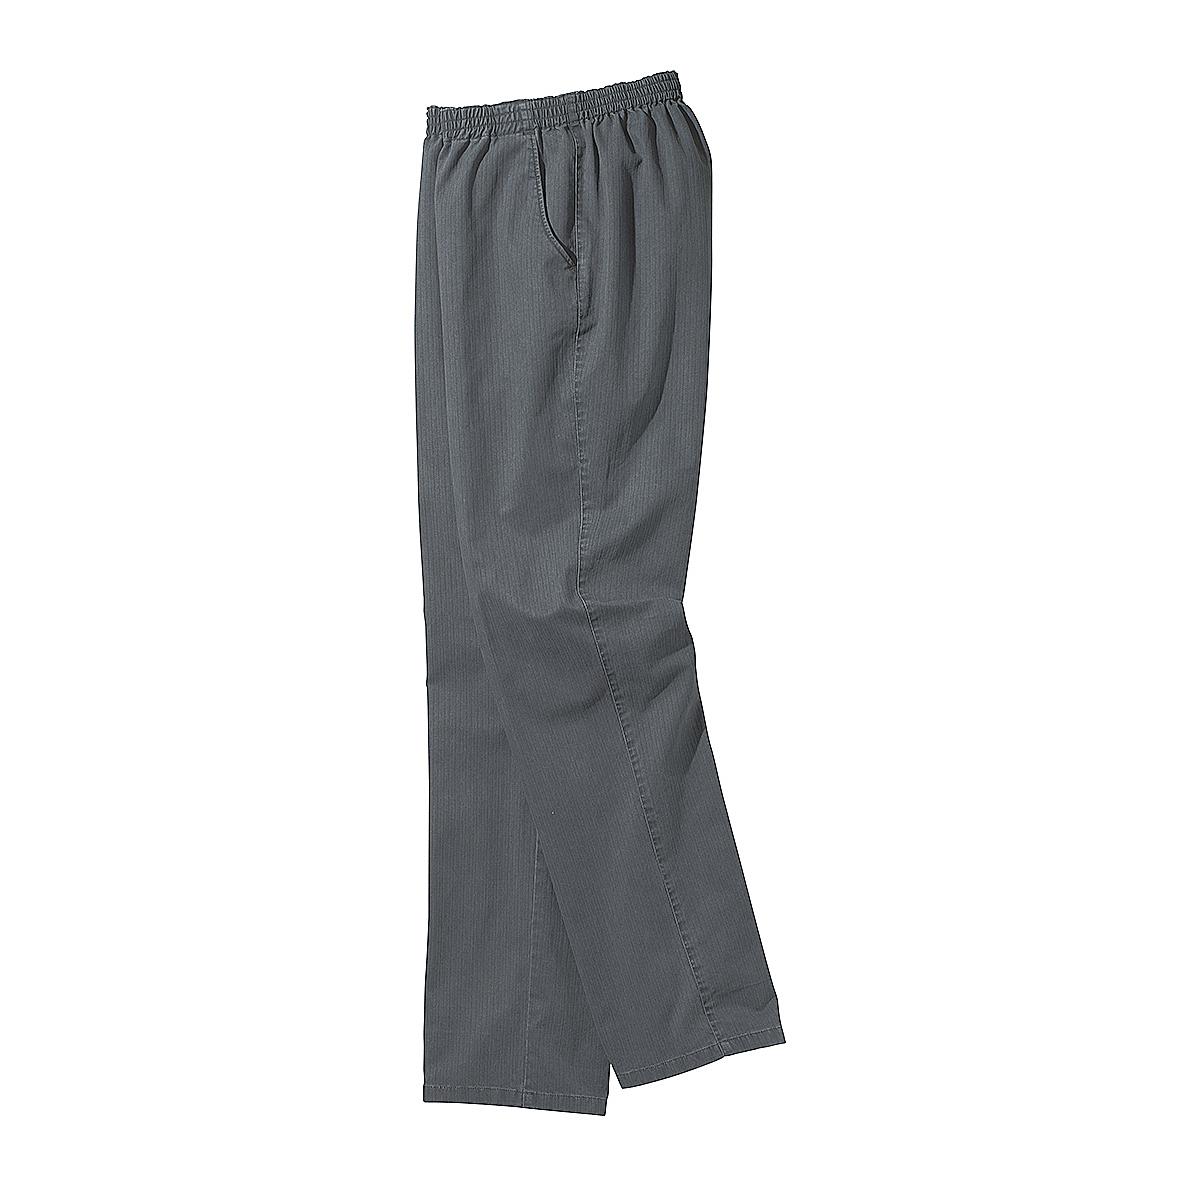 luigi morini bequeme schlupfhose mit gummizug farbe grau gr enspezialist m nnermode. Black Bedroom Furniture Sets. Home Design Ideas